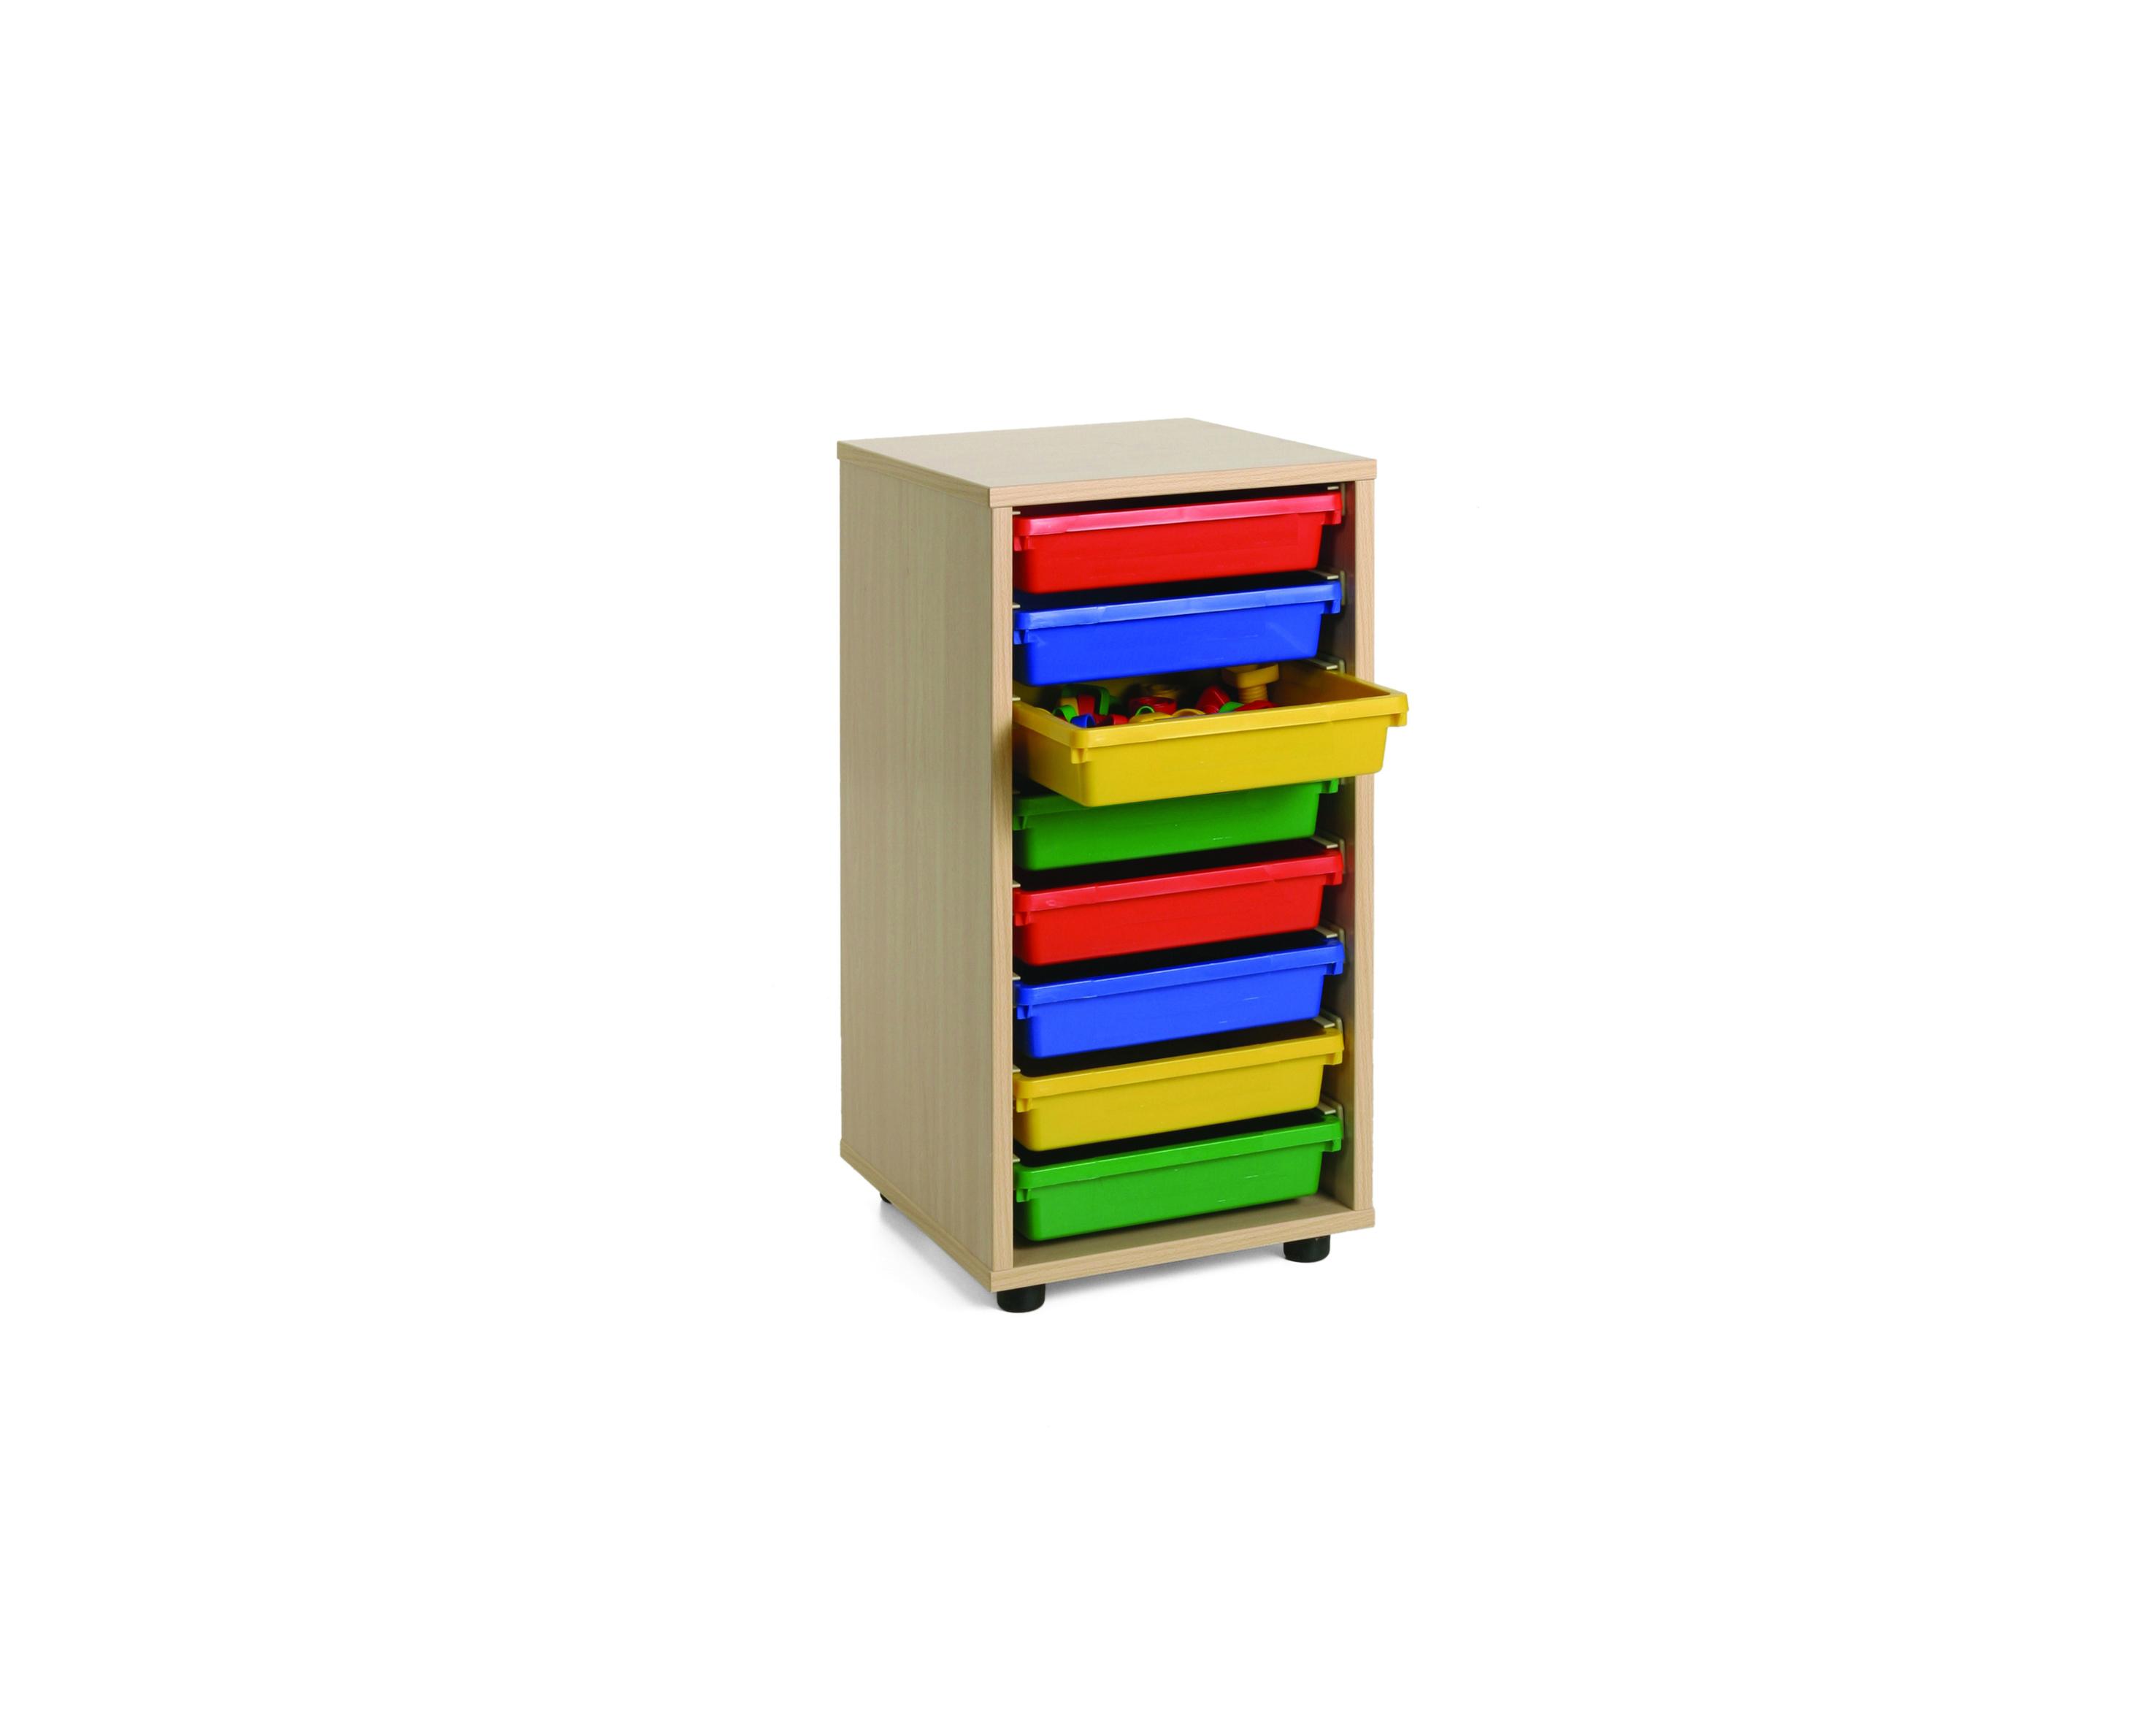 600209 mueble bajo cubetero 1 columna mobeduc for Mueble bajo mb9 05